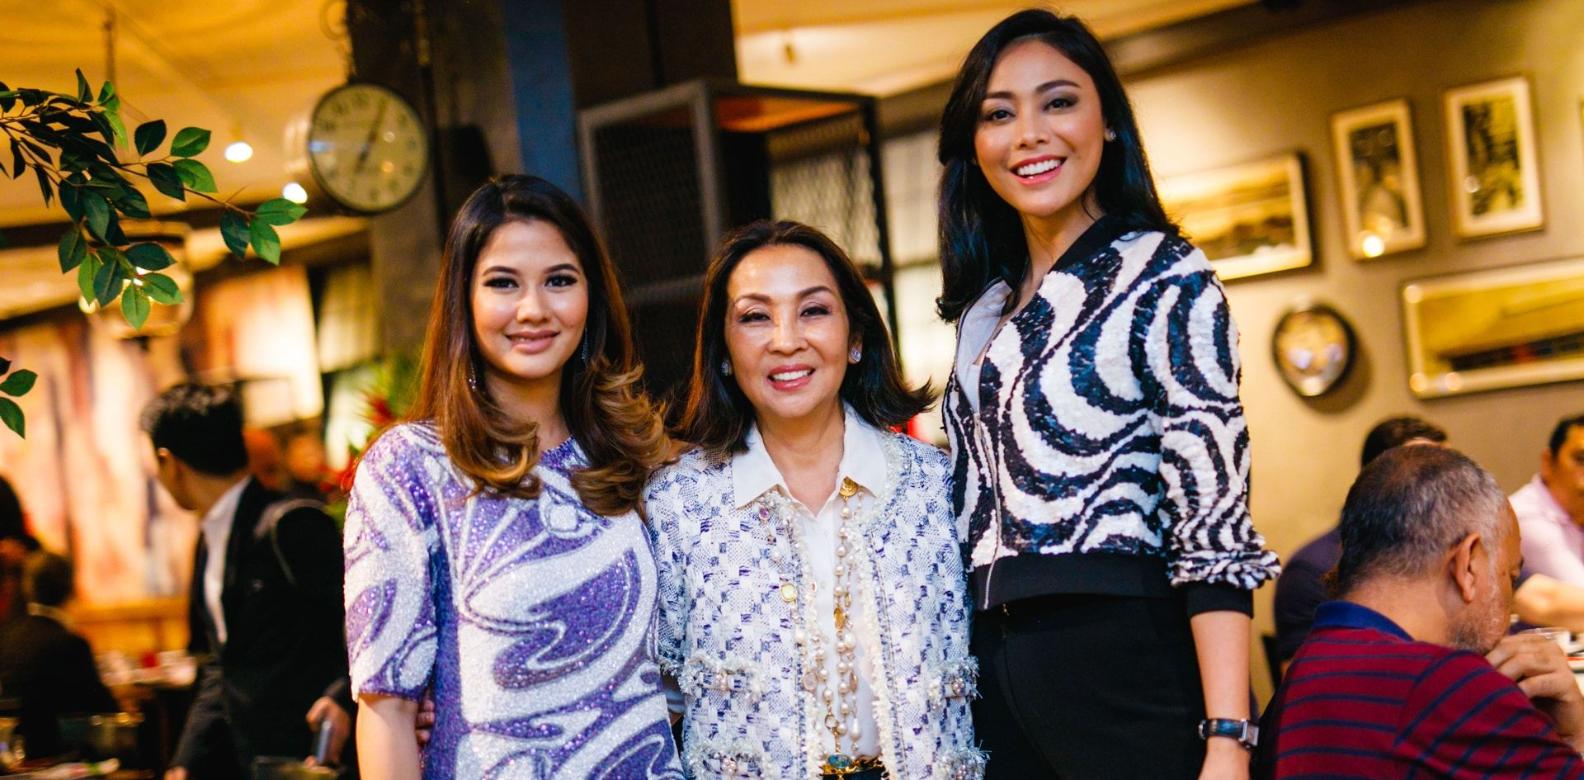 Sonia Rashidi, Dato' Seri Farah Khan and Whulandary Herman